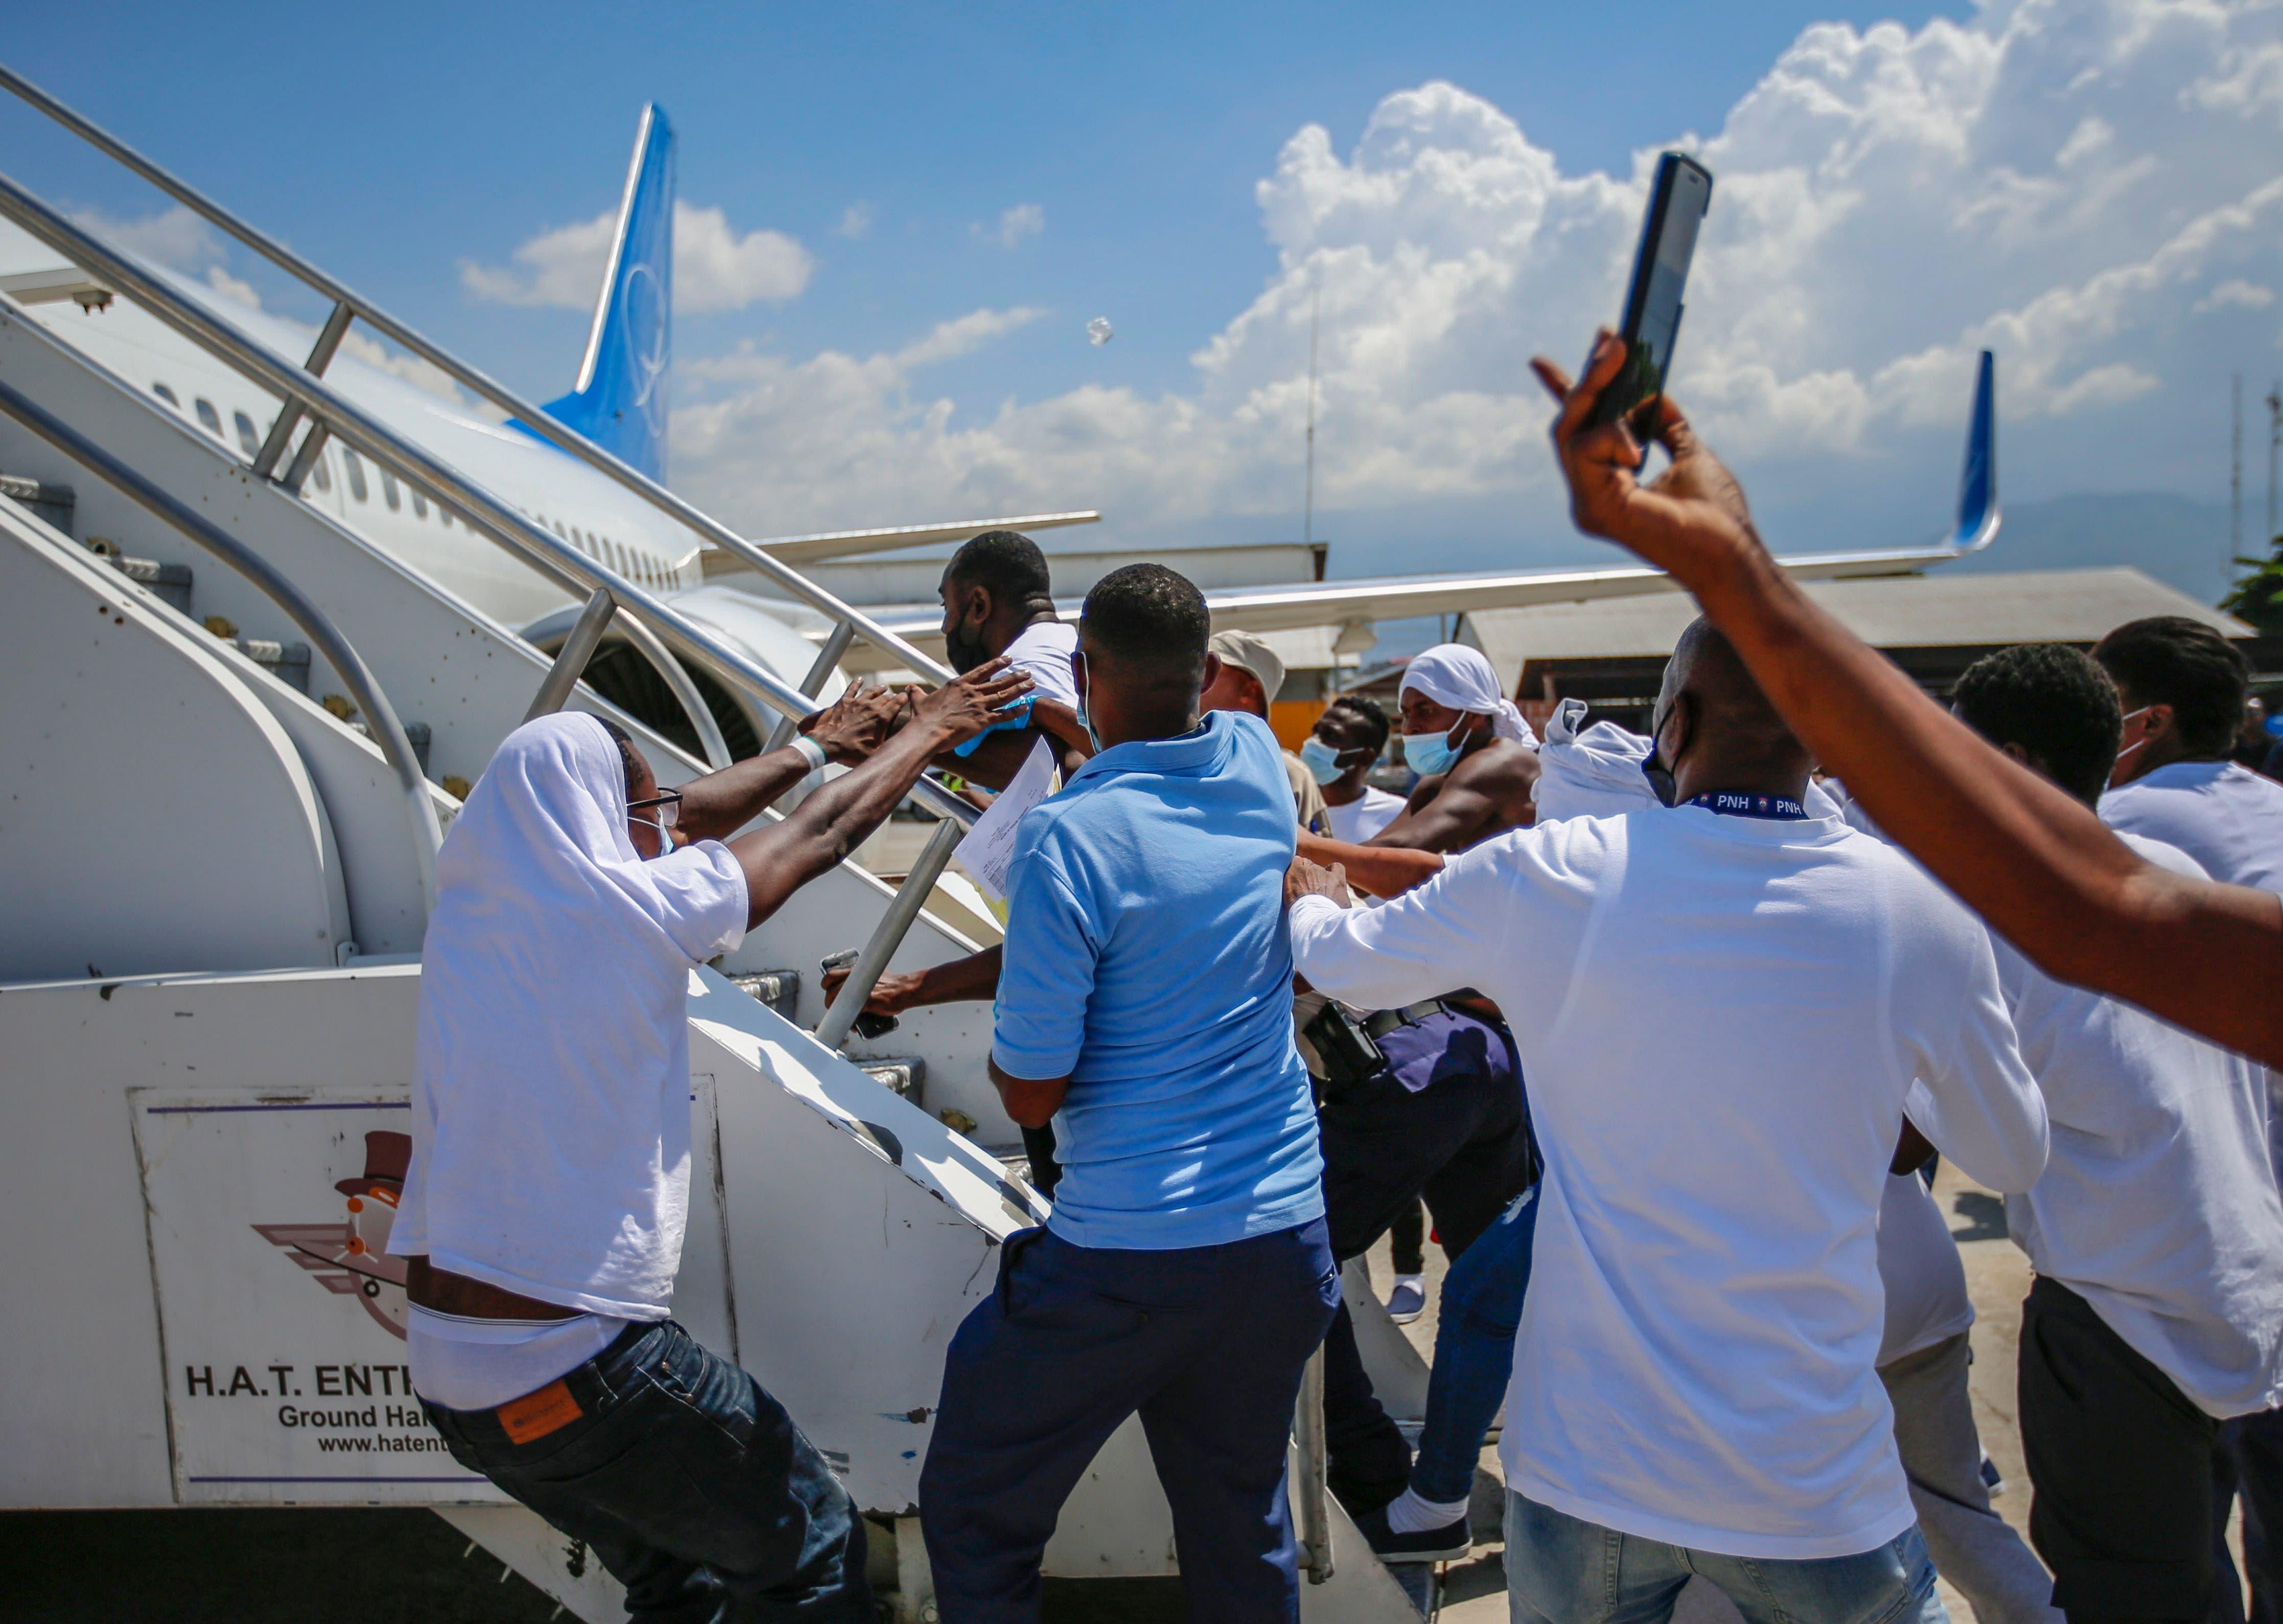 Haití ha recibido a 1.314 migrantes deportados desde Estados Unidos